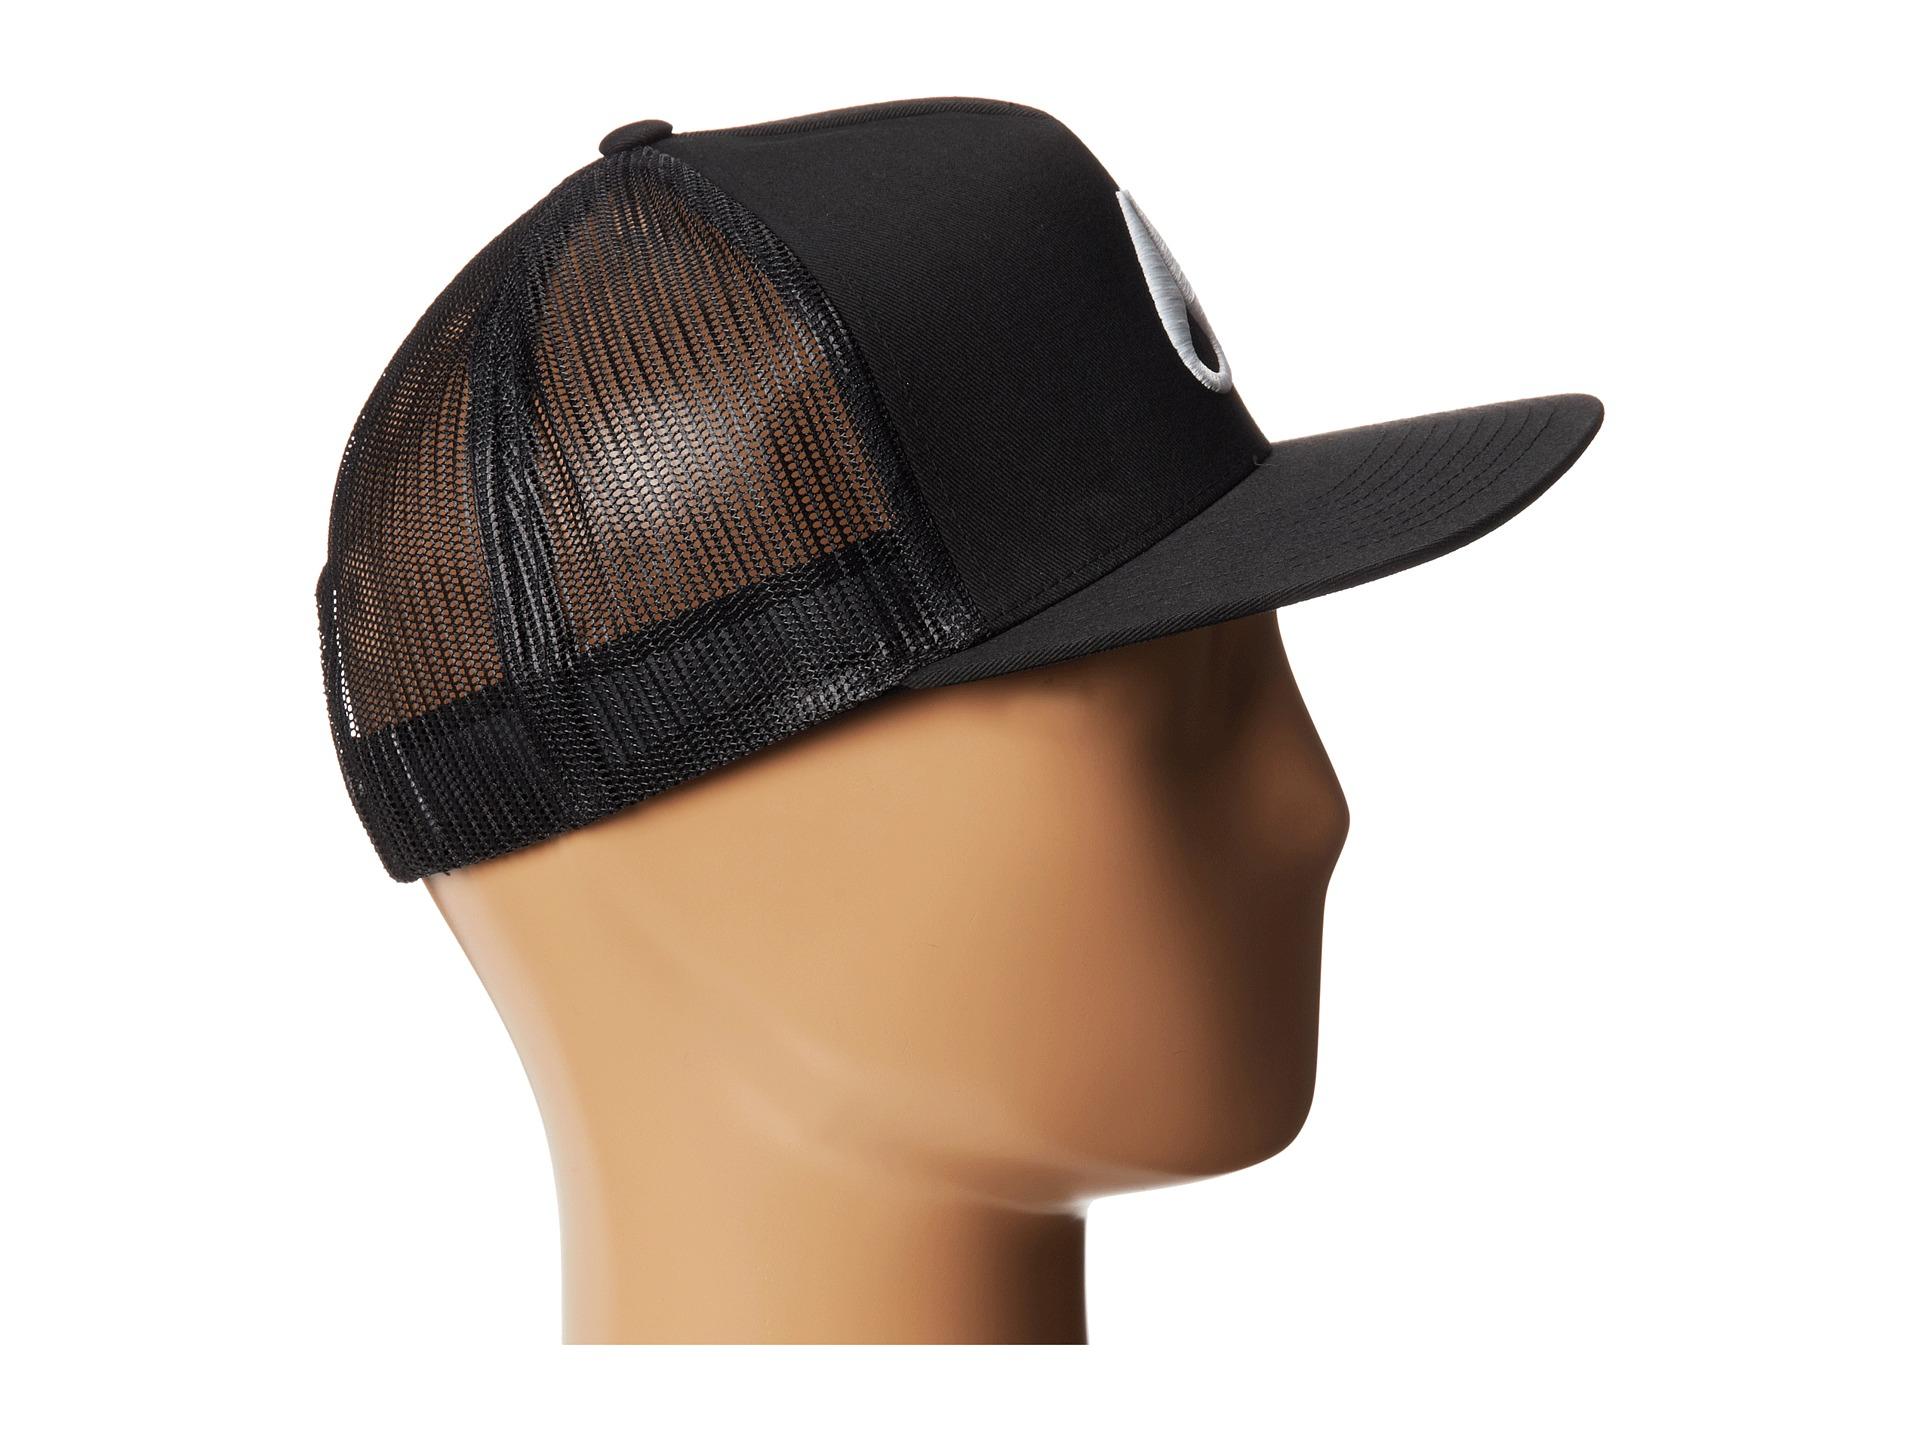 Lyst - Nixon Deep Down Trucker Hat in Black 923cba6deac